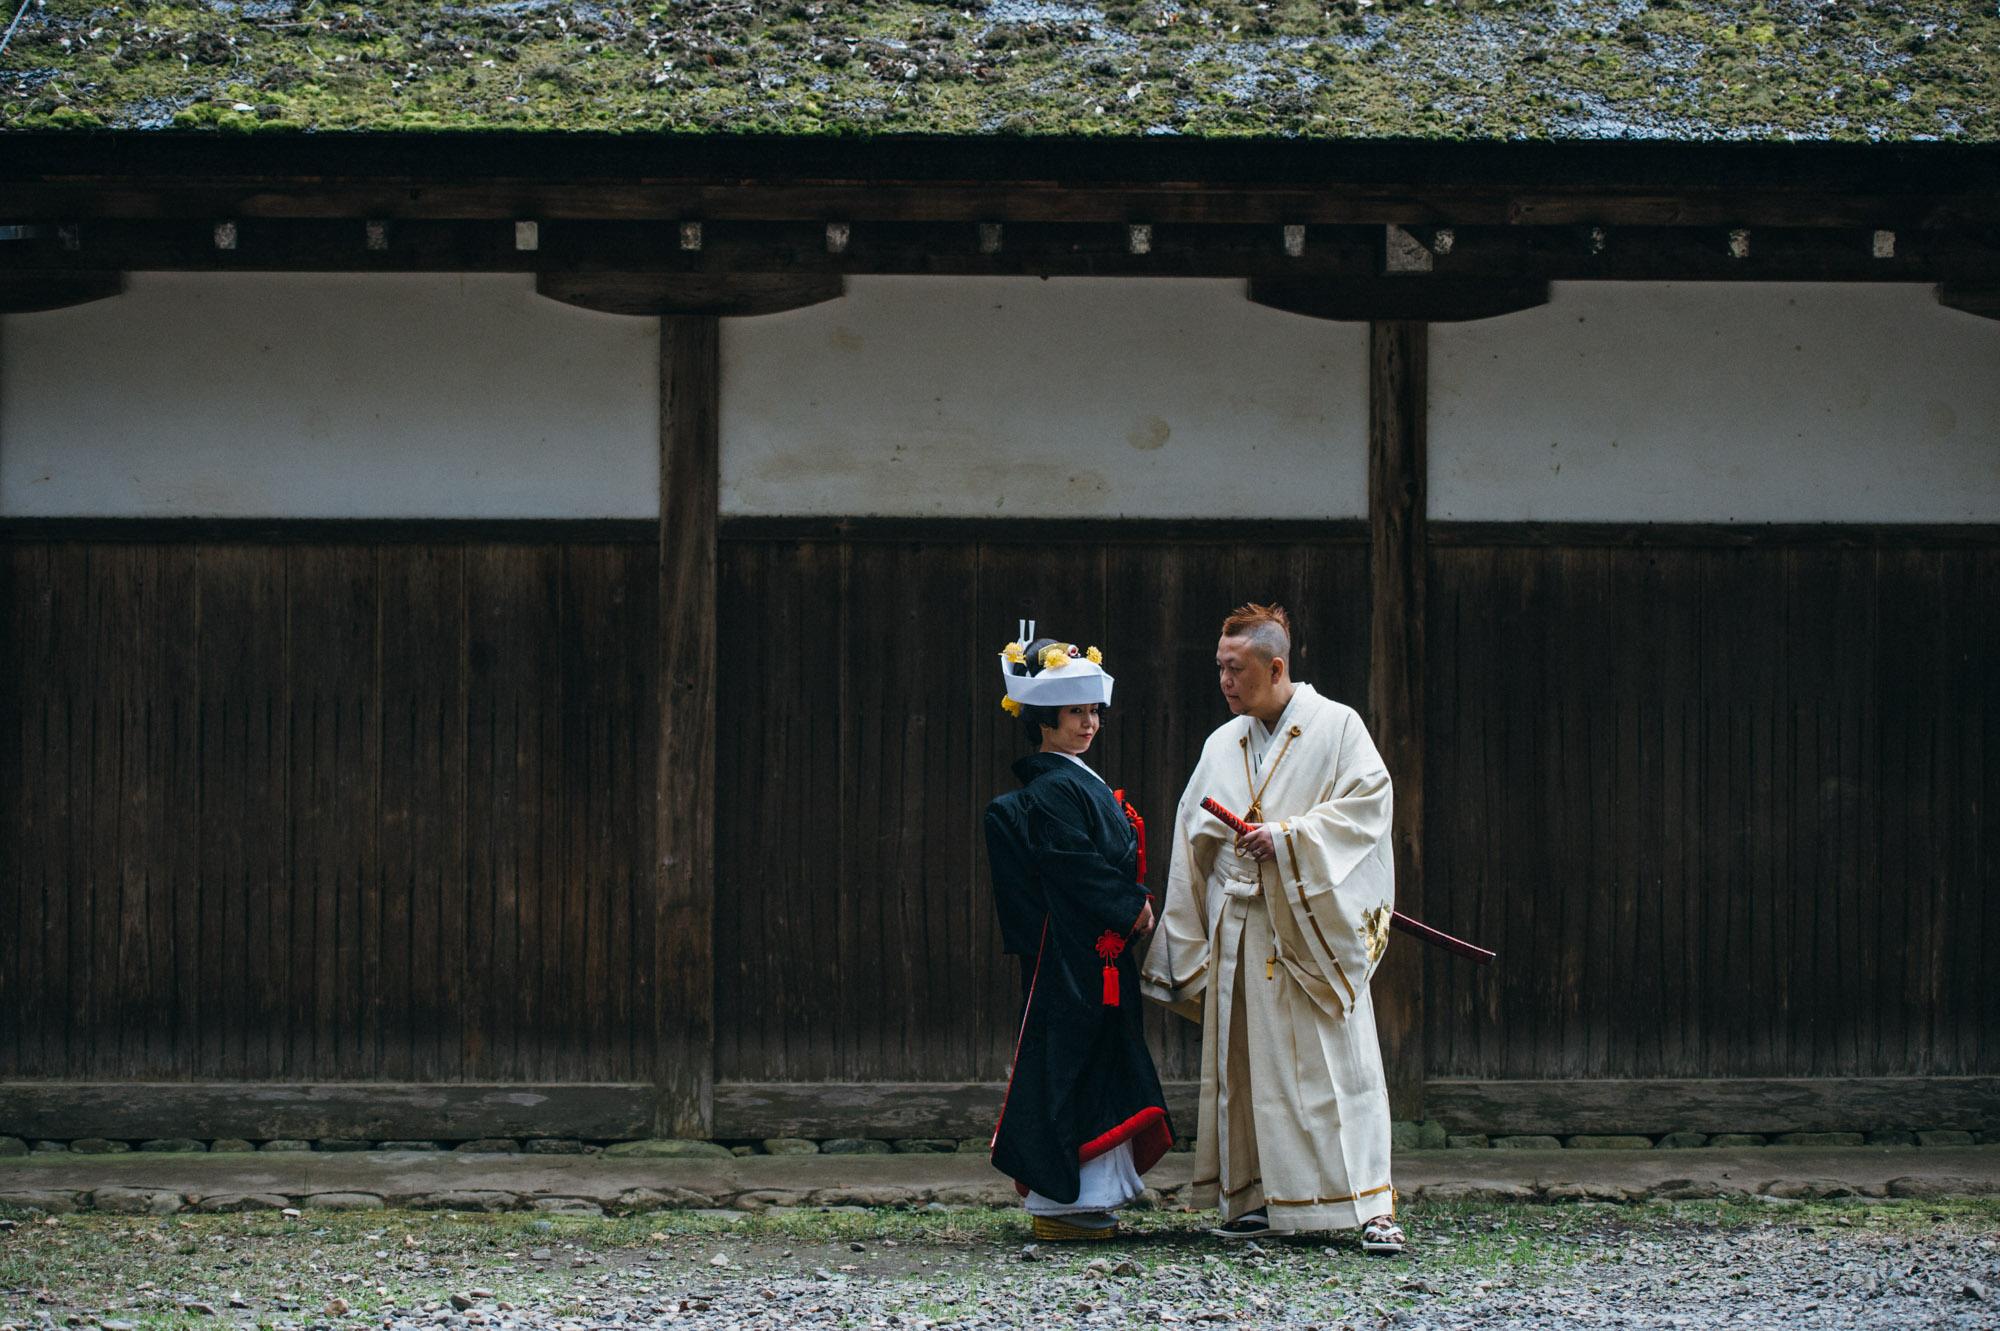 shiga maedori114